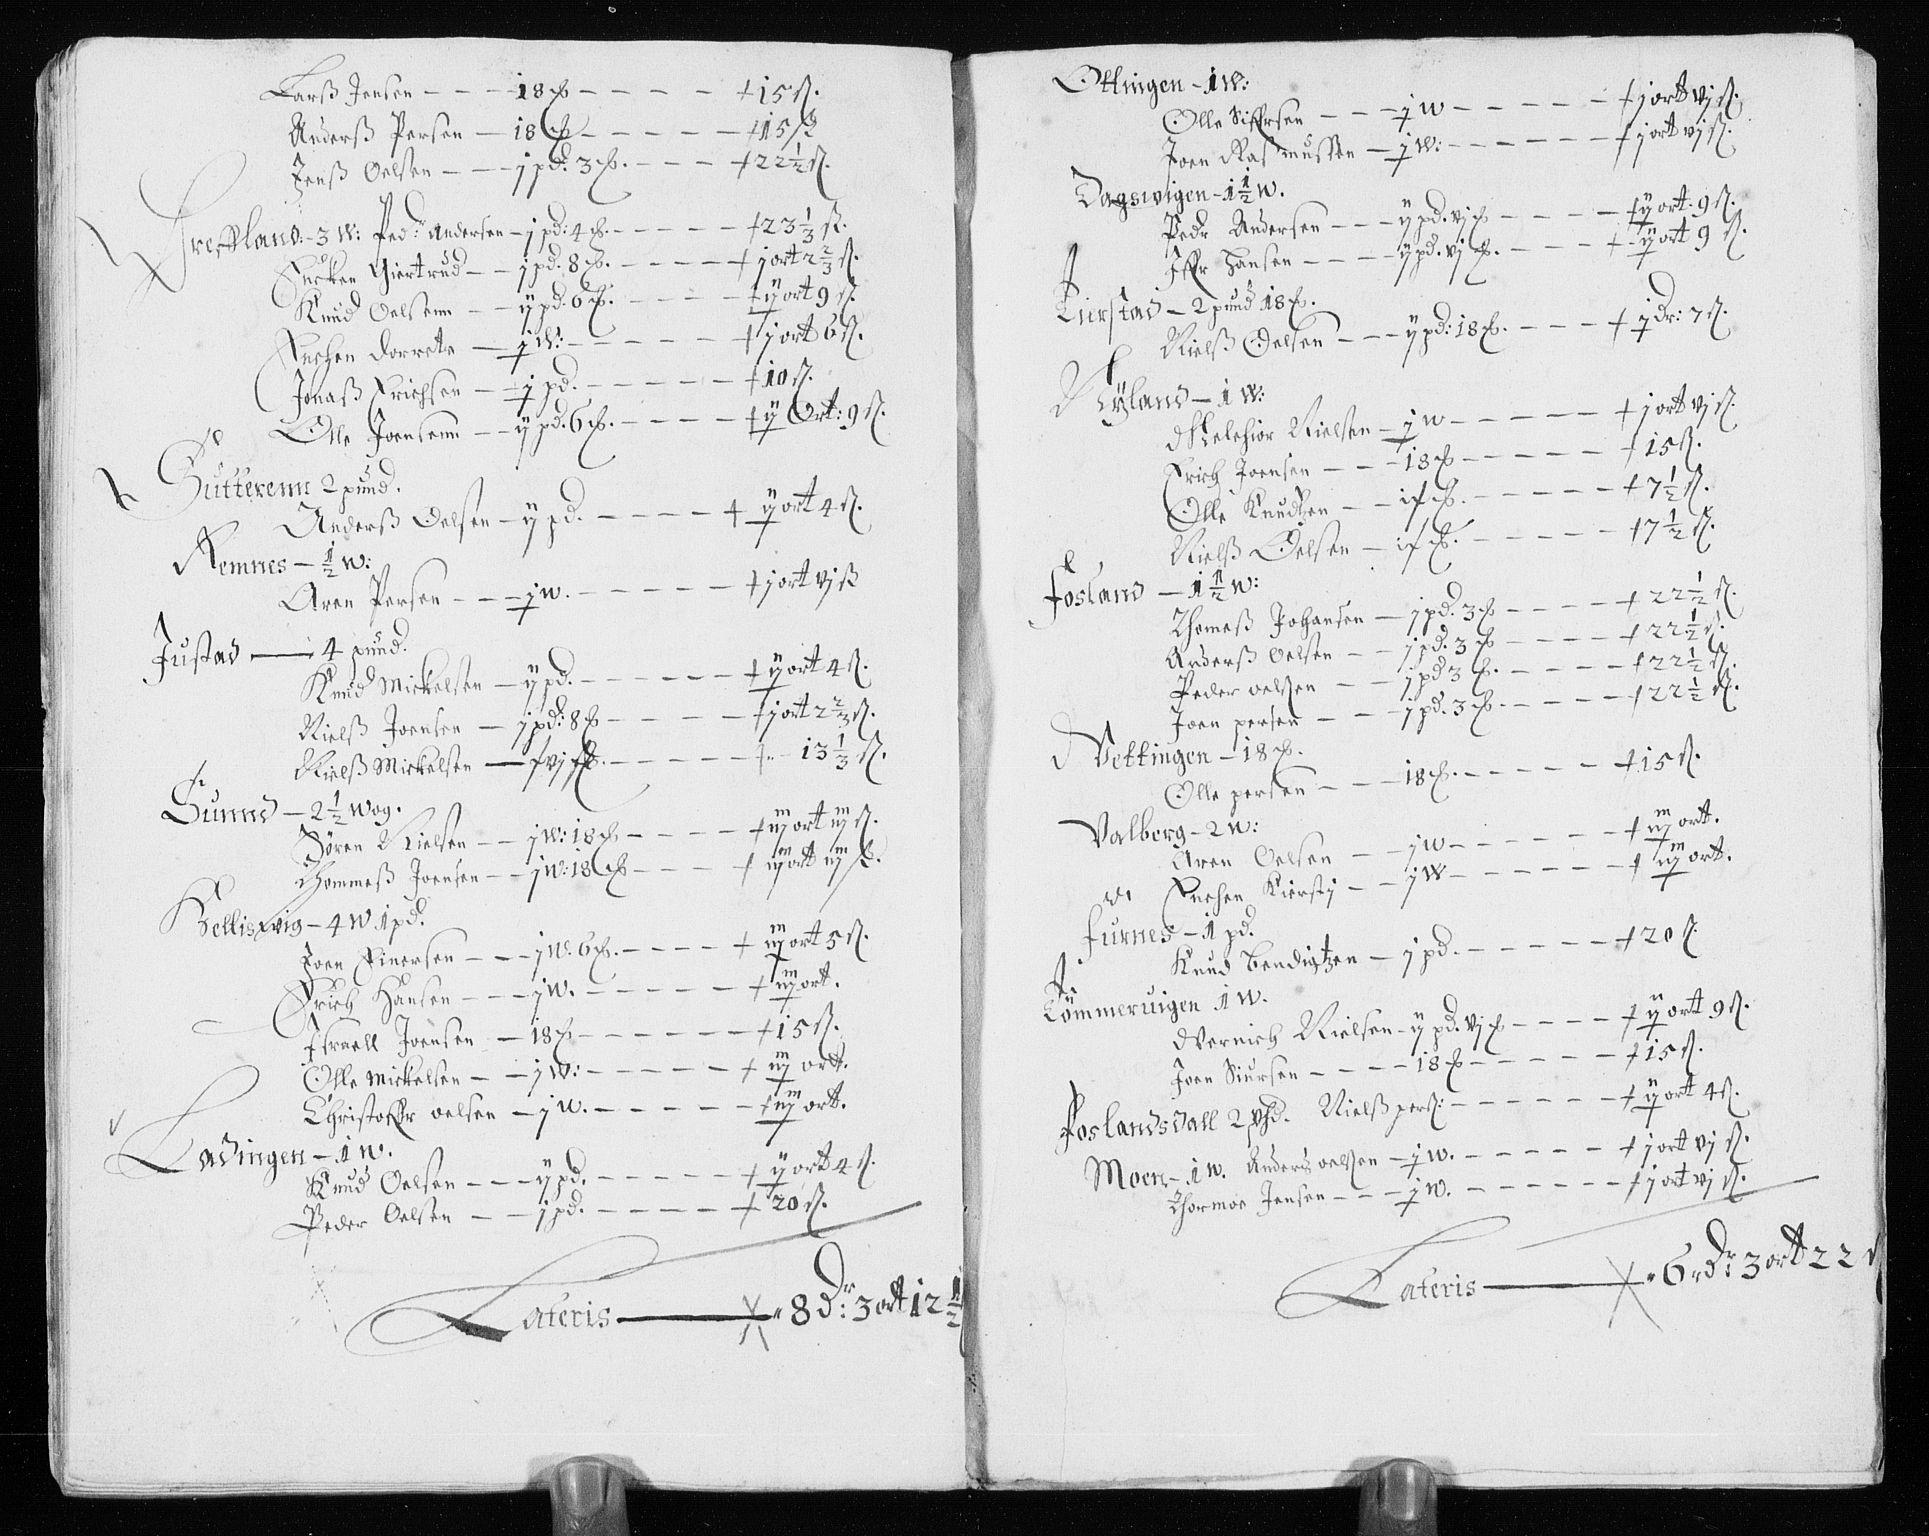 RA, Rentekammeret inntil 1814, Reviderte regnskaper, Stiftamtstueregnskaper, Trondheim stiftamt og Nordland amt, R/Rh/L0001: Nordland amt, 1670-1671